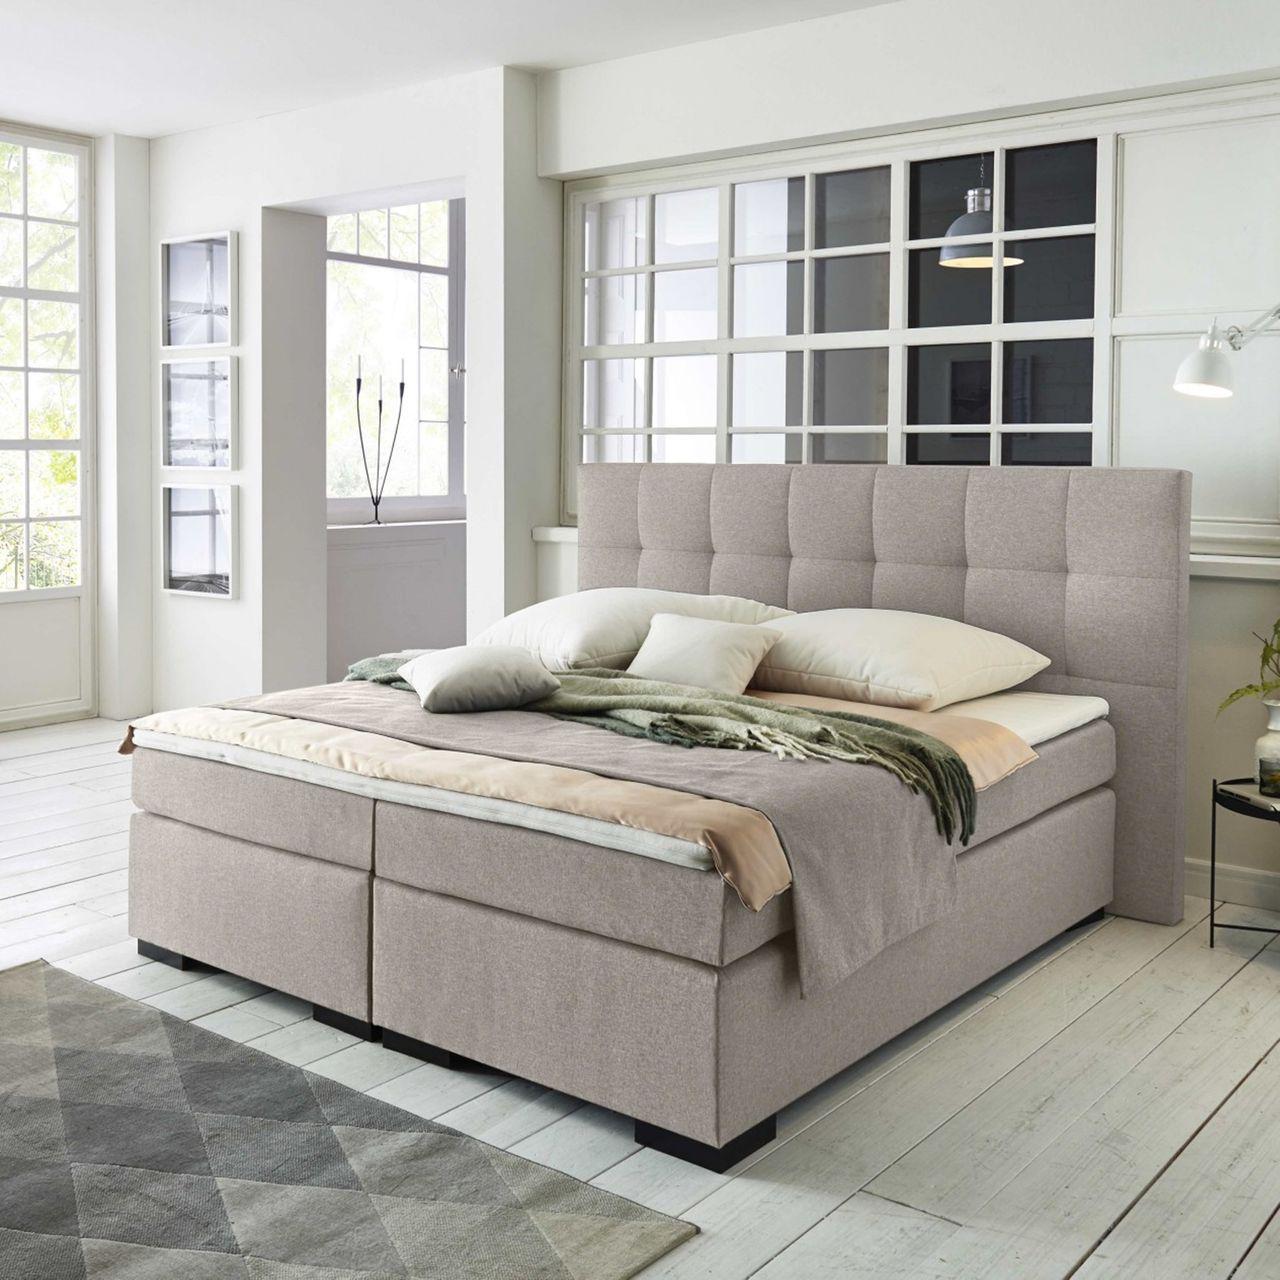 boxspringbett monaco mit komfort matratze belvandeo